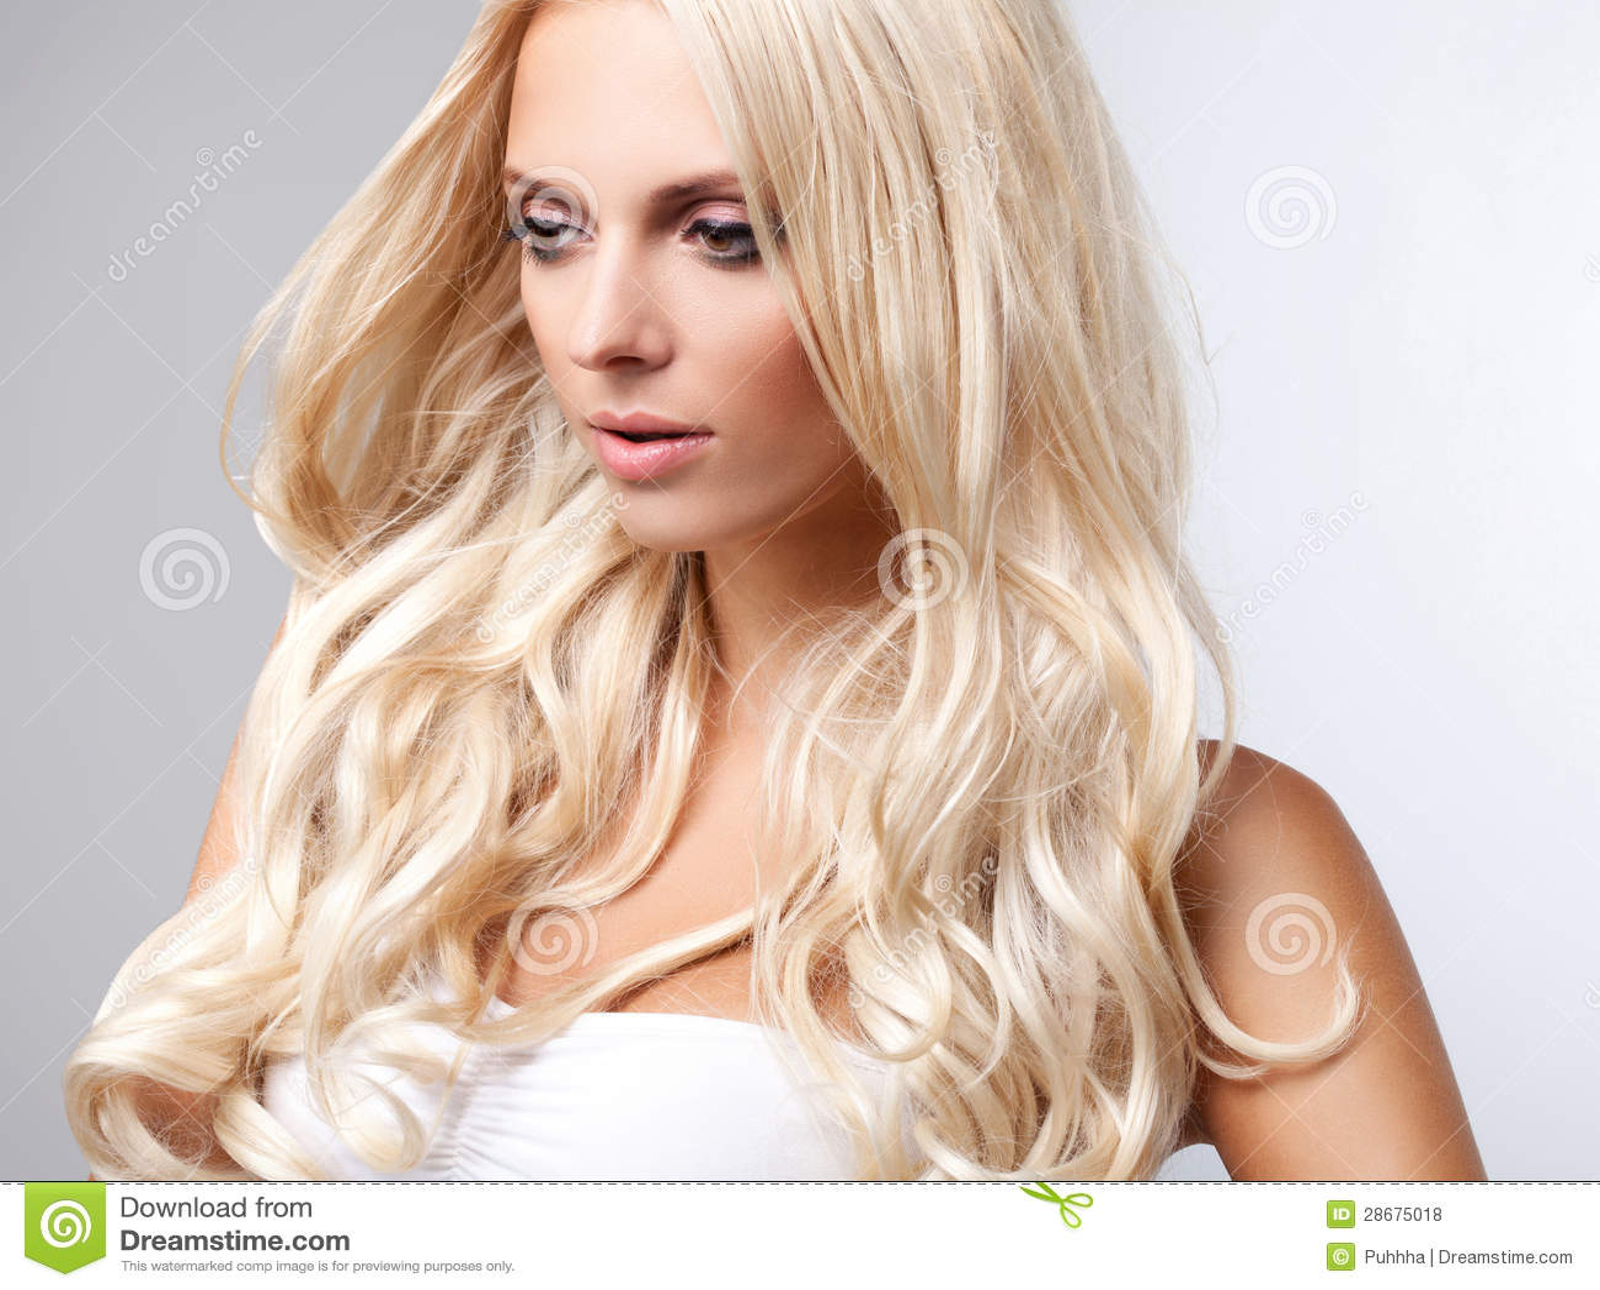 hair stock photos - photo #22